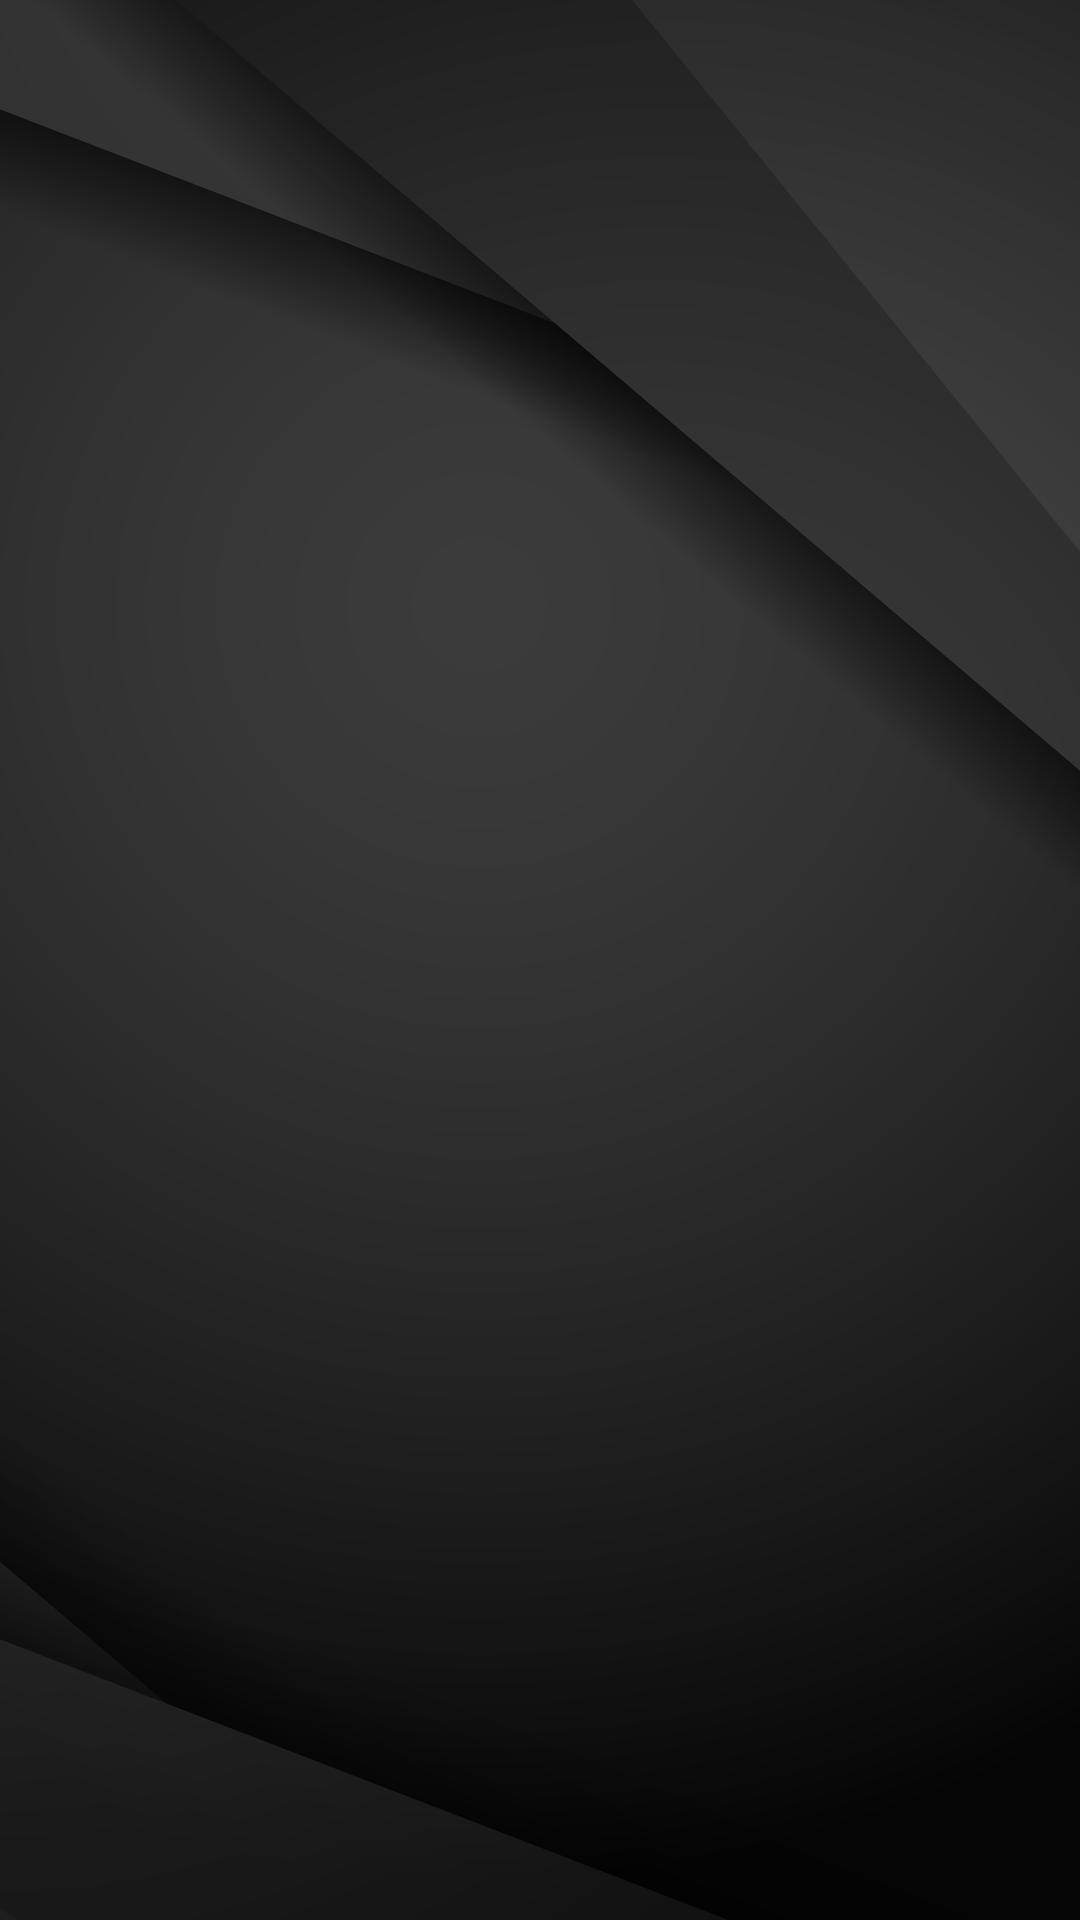 Dark Ultra Hd Phone Wallpapers Wallpaper Cave